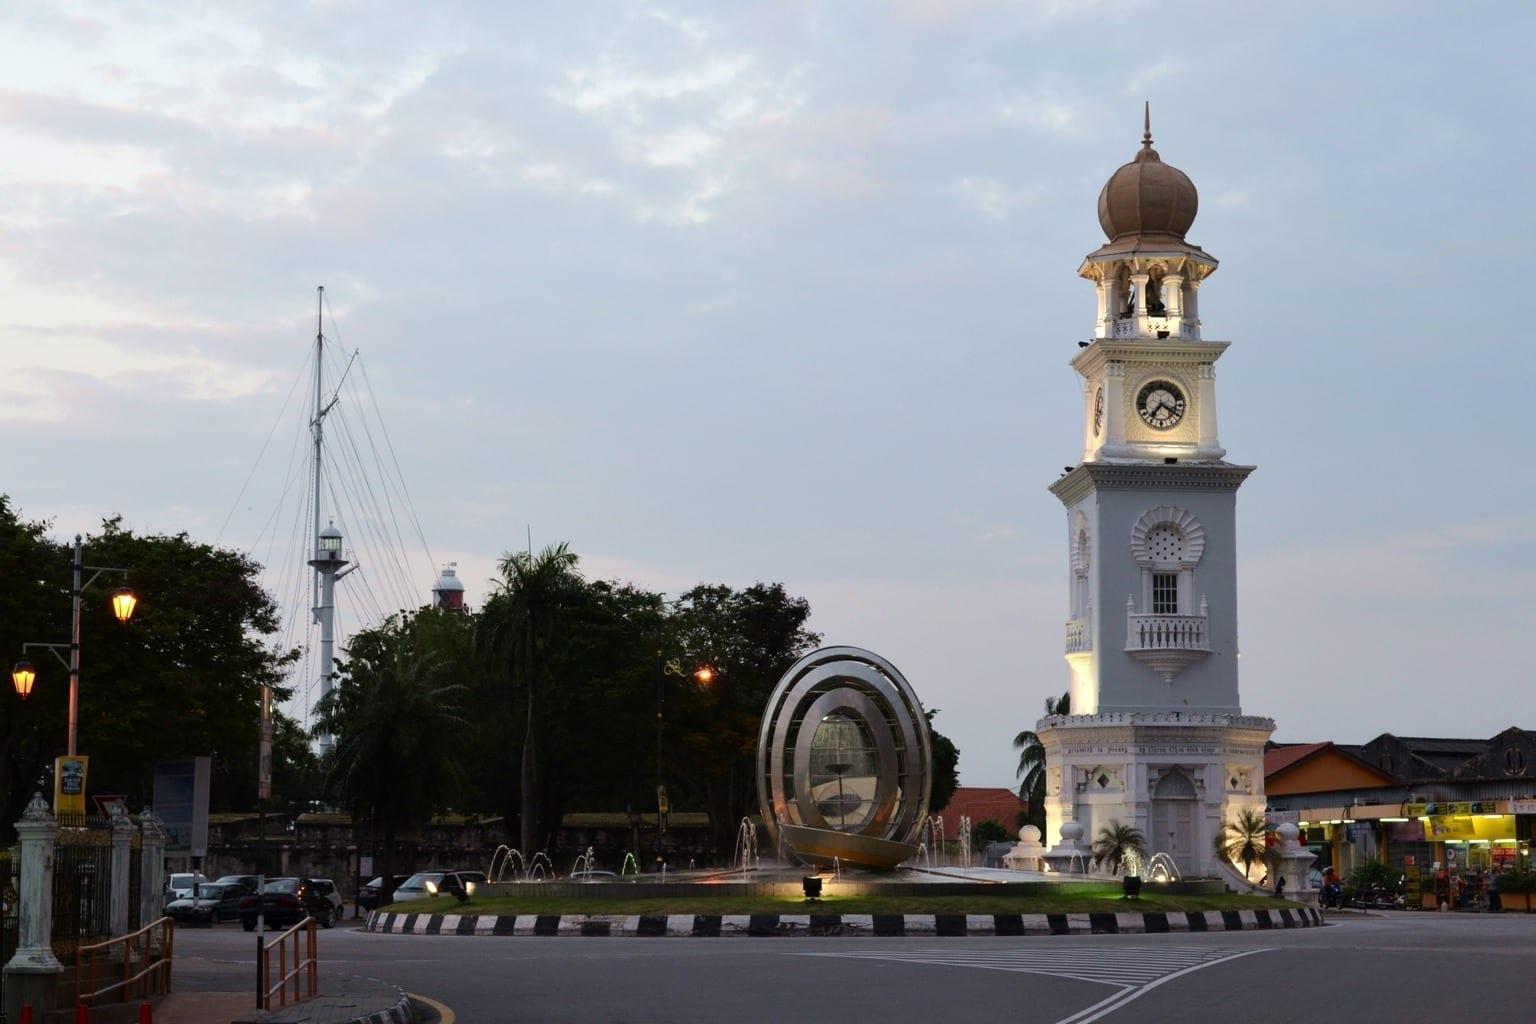 Torre del reloj en memoria de la Reina Victoria George Town Malasia